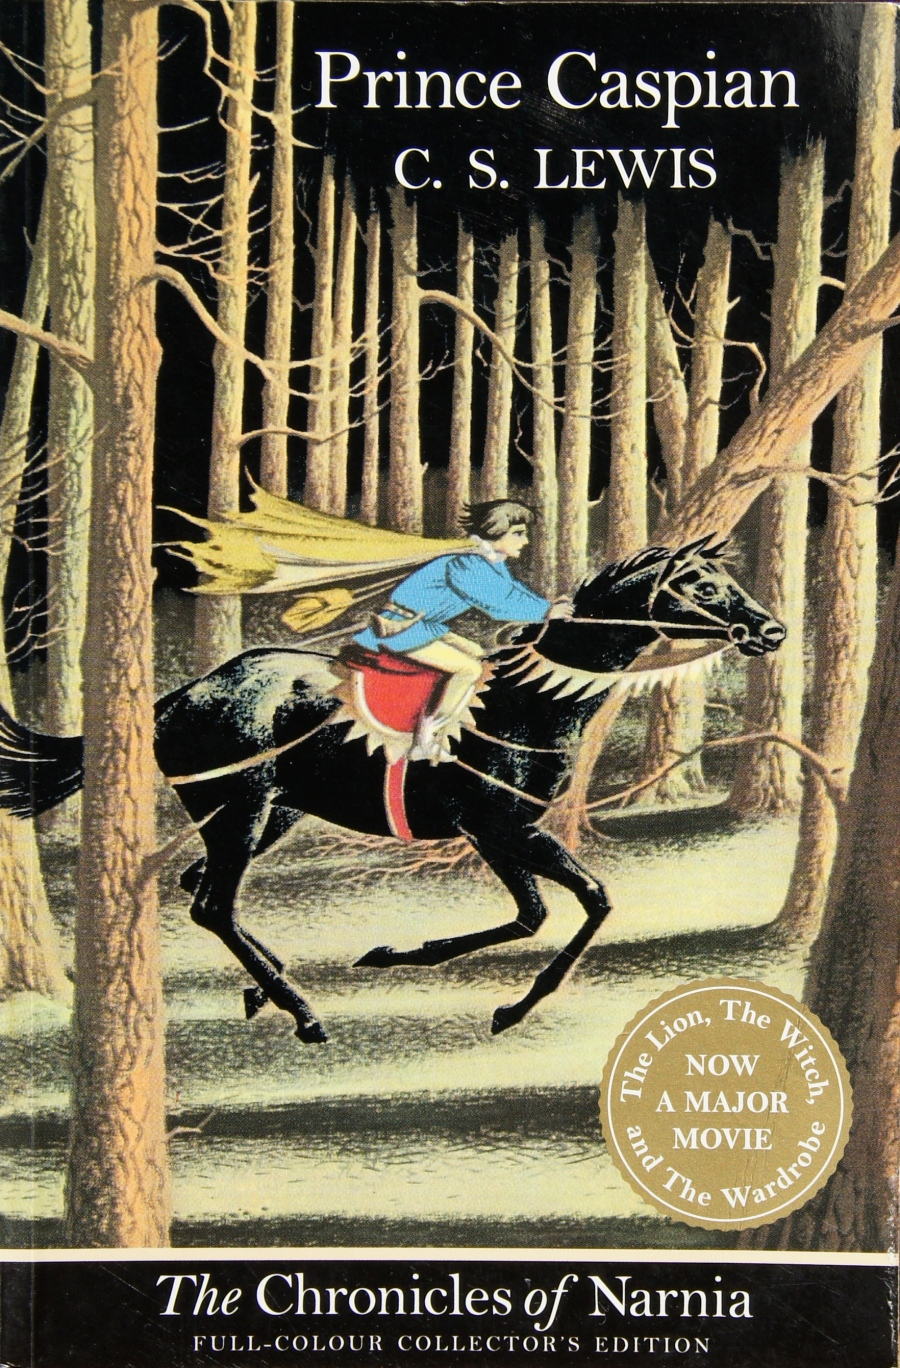 Prince Caspian cover